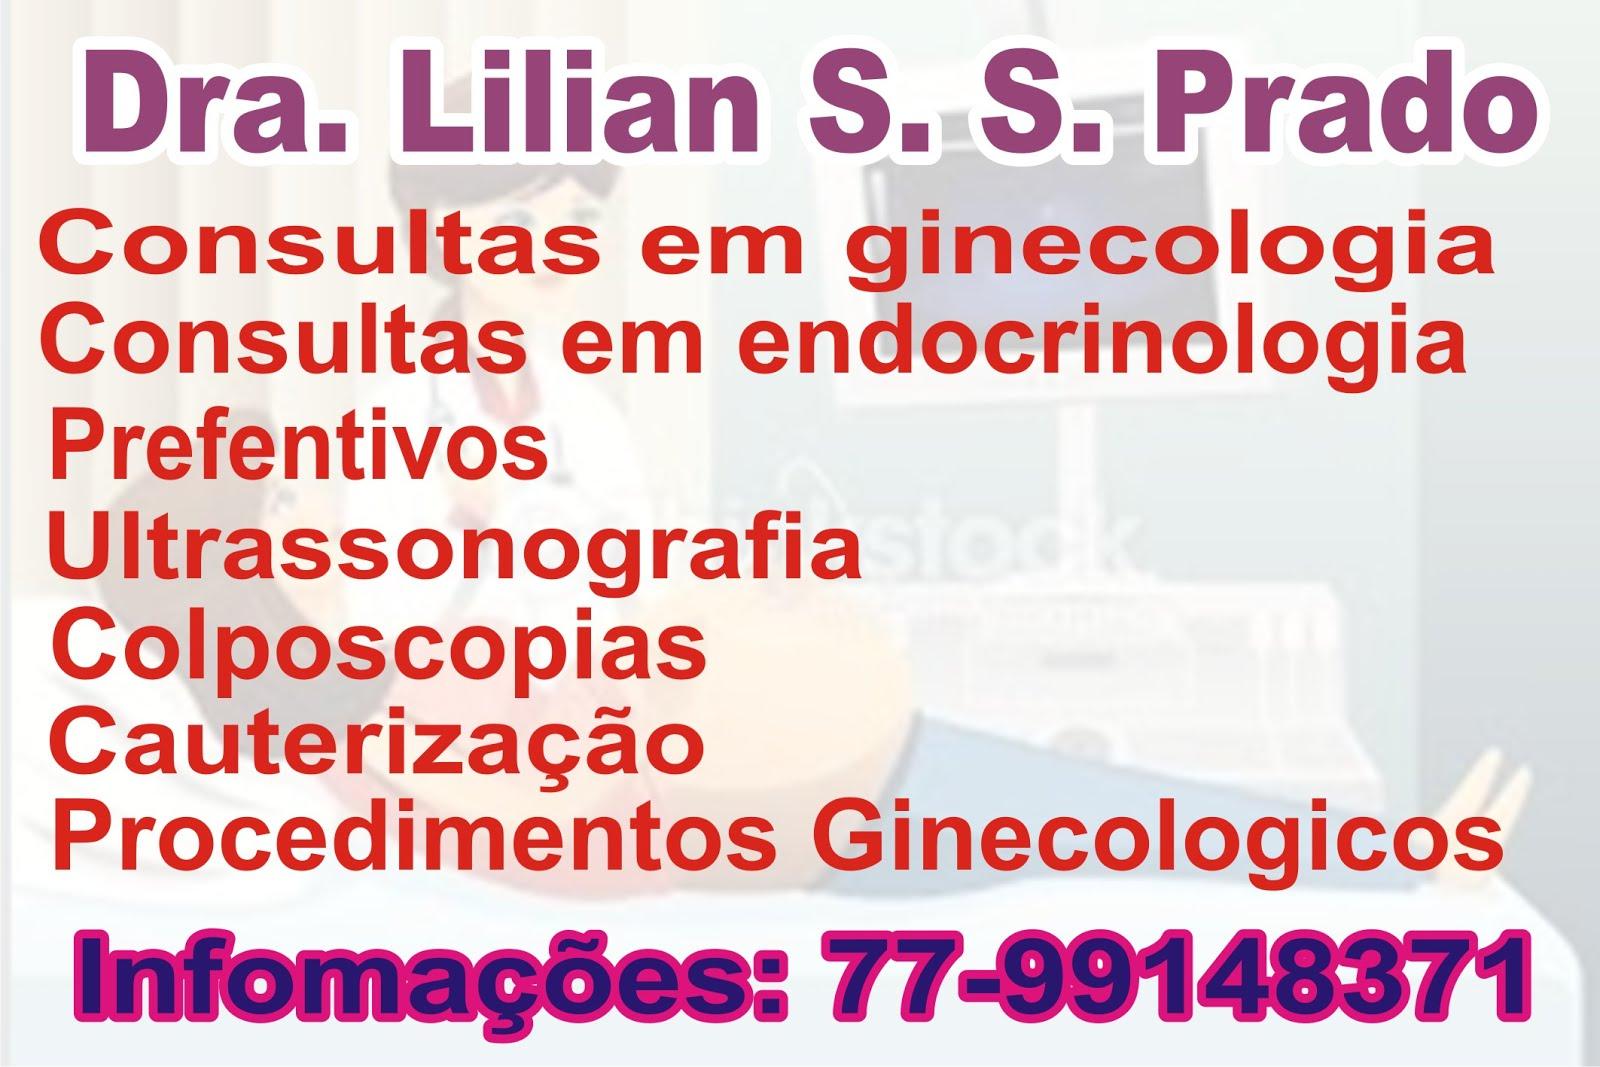 Dra. Lilian